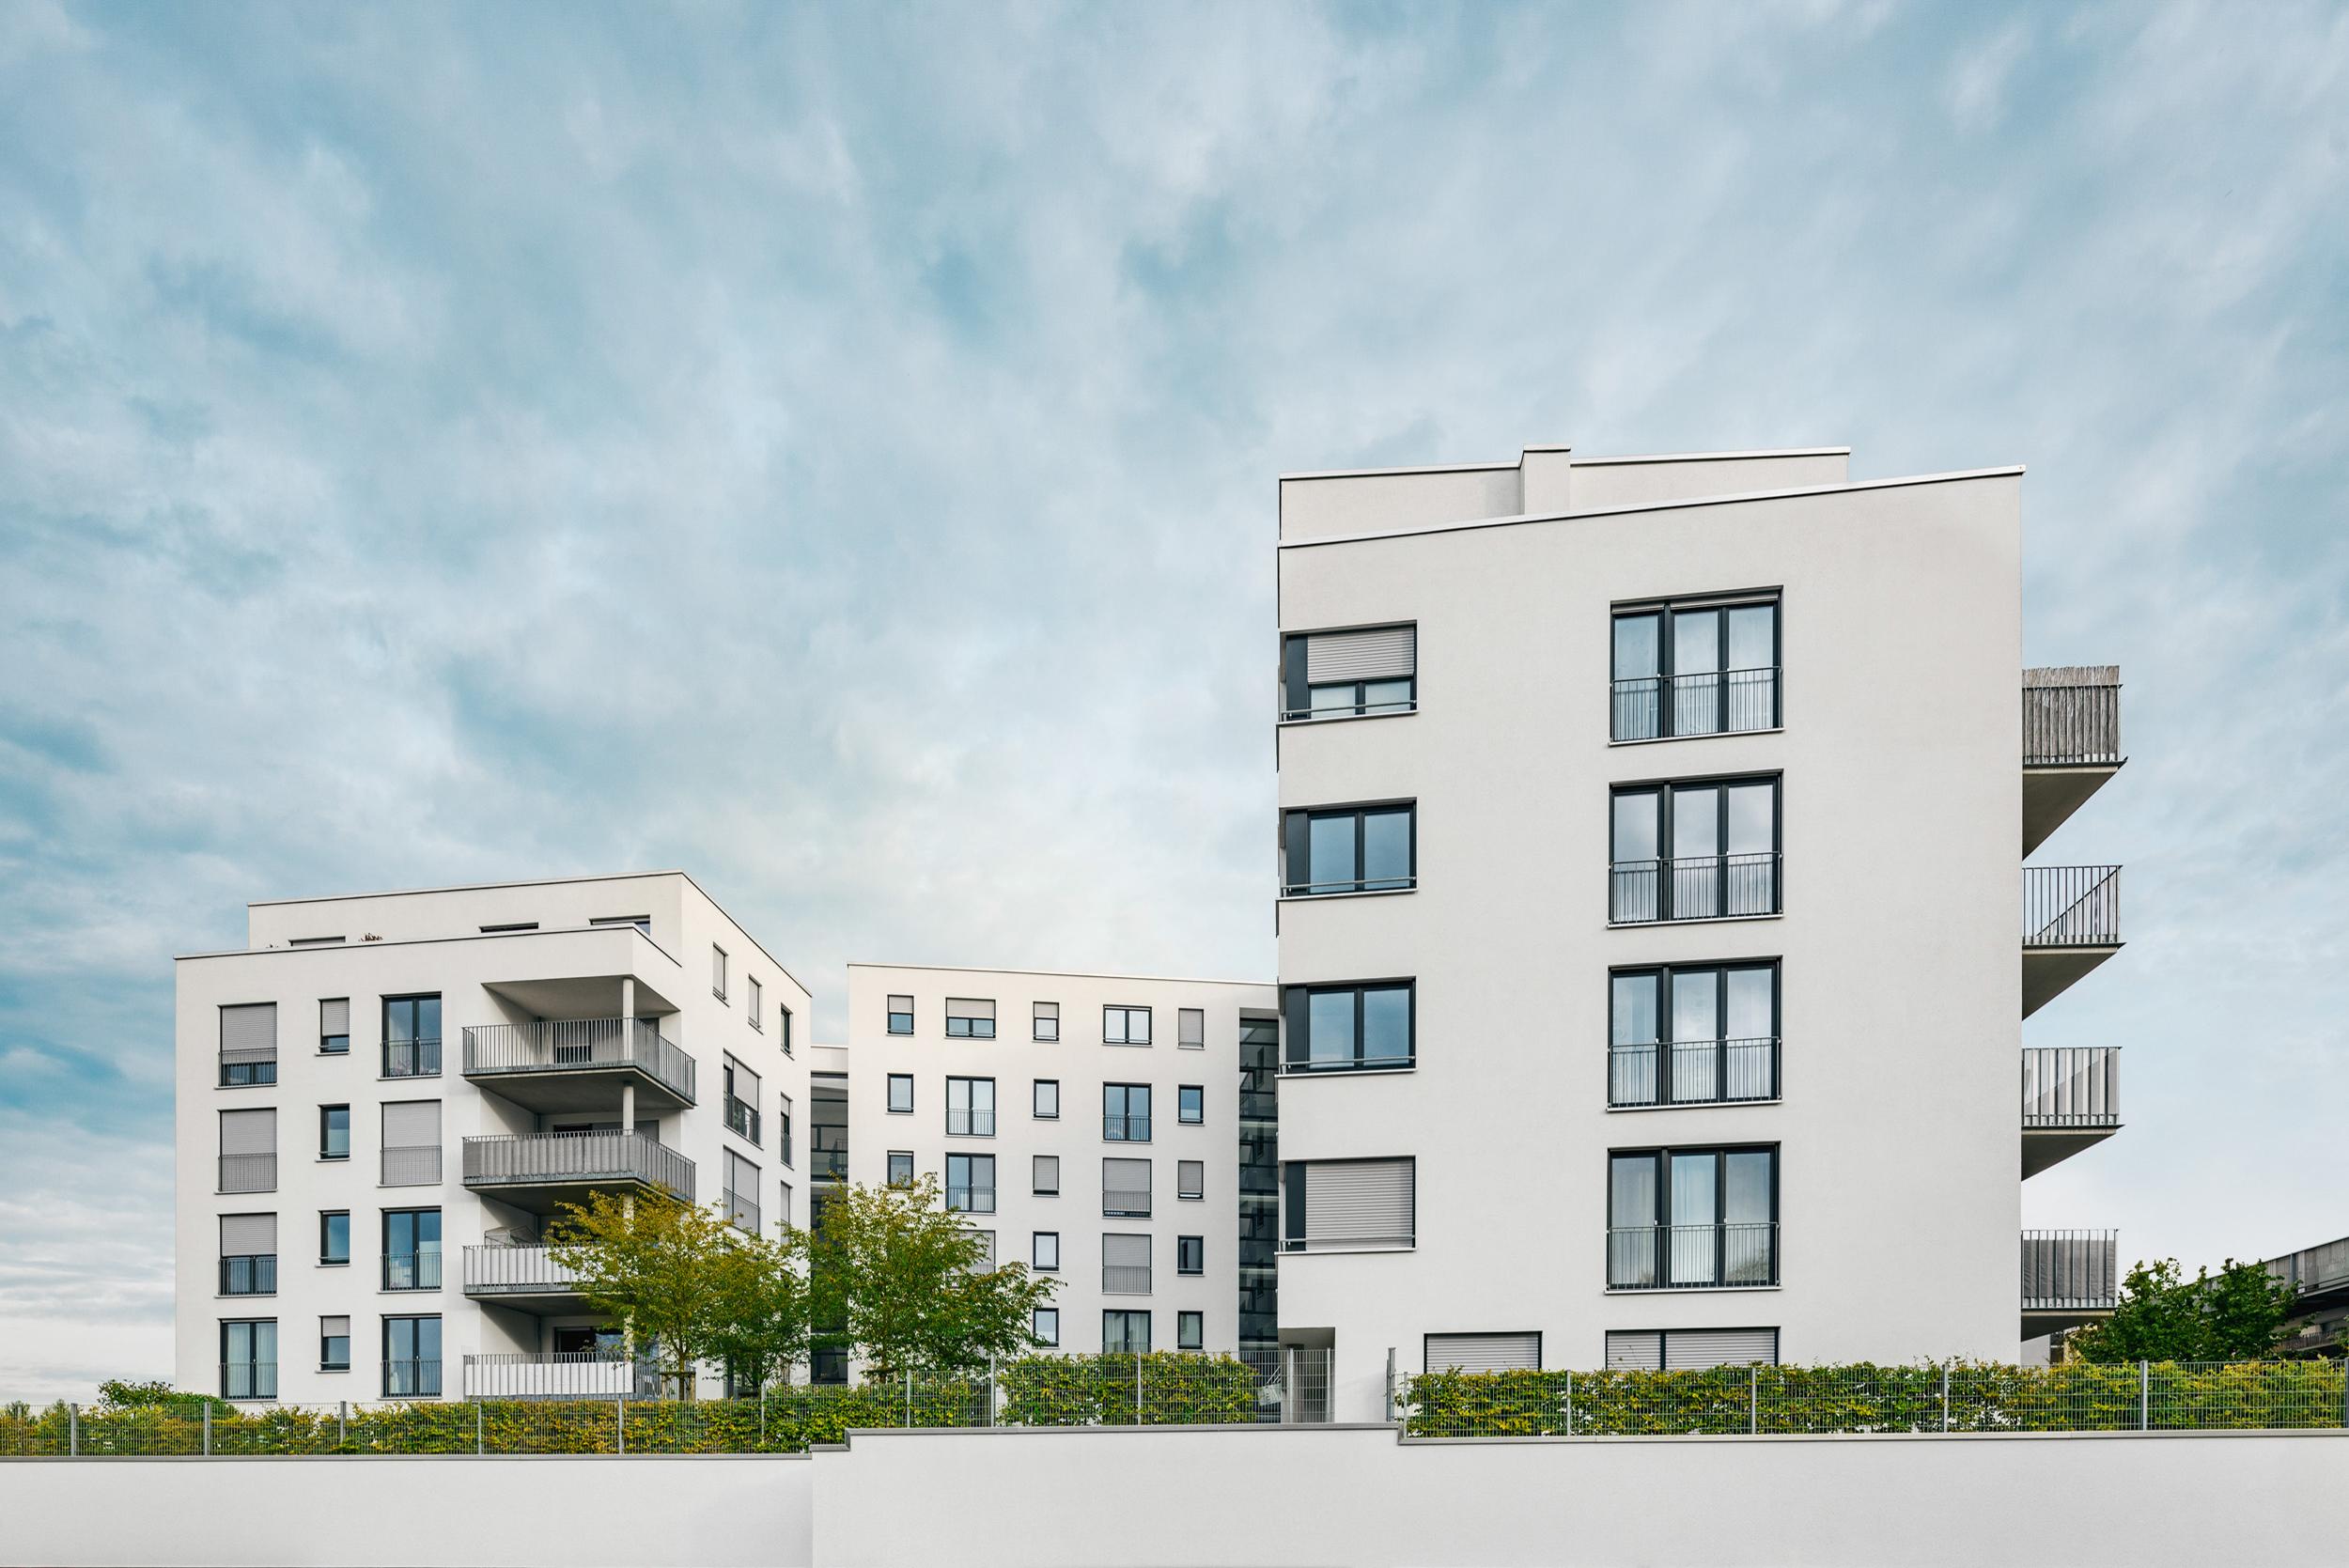 Gustav-Epple-Bauunternehmung-Meluner-Straße-MLX8097